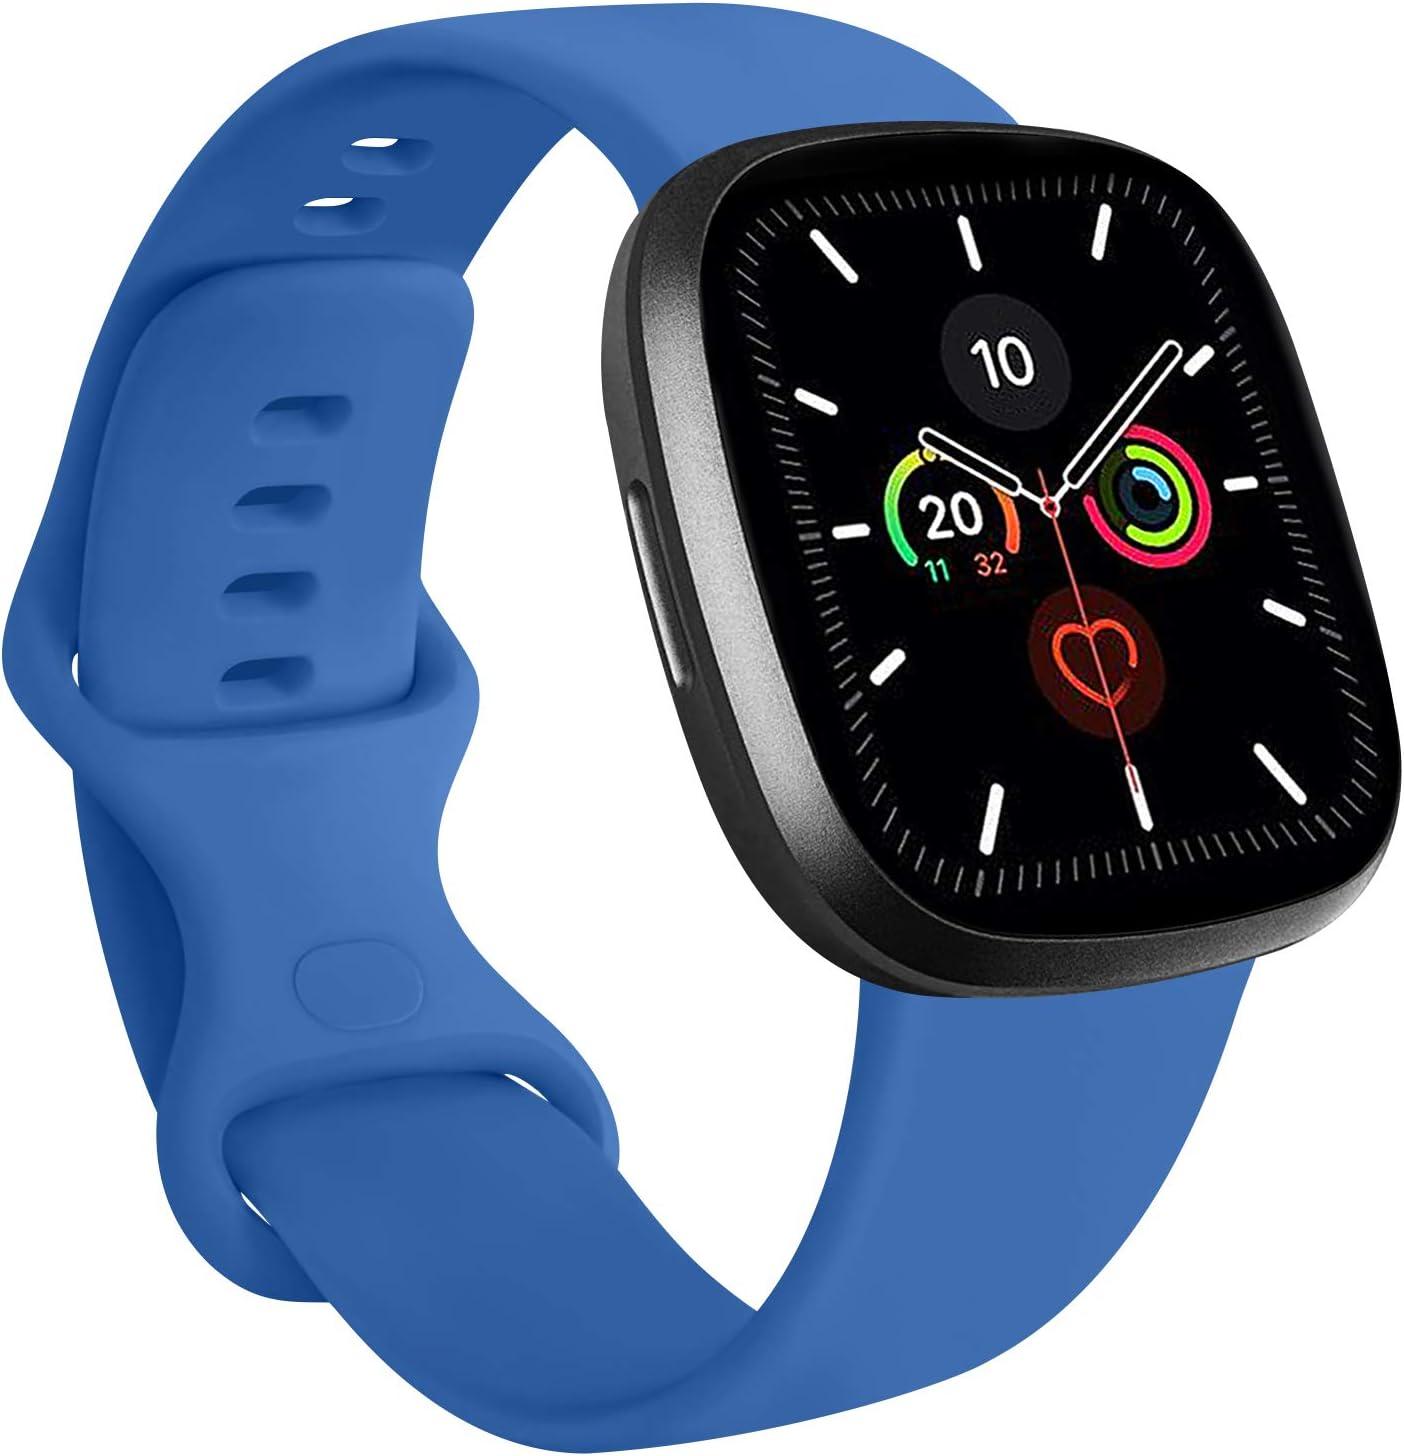 RAZAN Silicona Correa Compatible con Apple Watch 38mm 42mm 40mm 44mm,Pulseras de Repuesto de Silicona Suave para iWatch Series 6 5 4 3 2 1 (42mm/44mm S/M, Azul Zafiro)